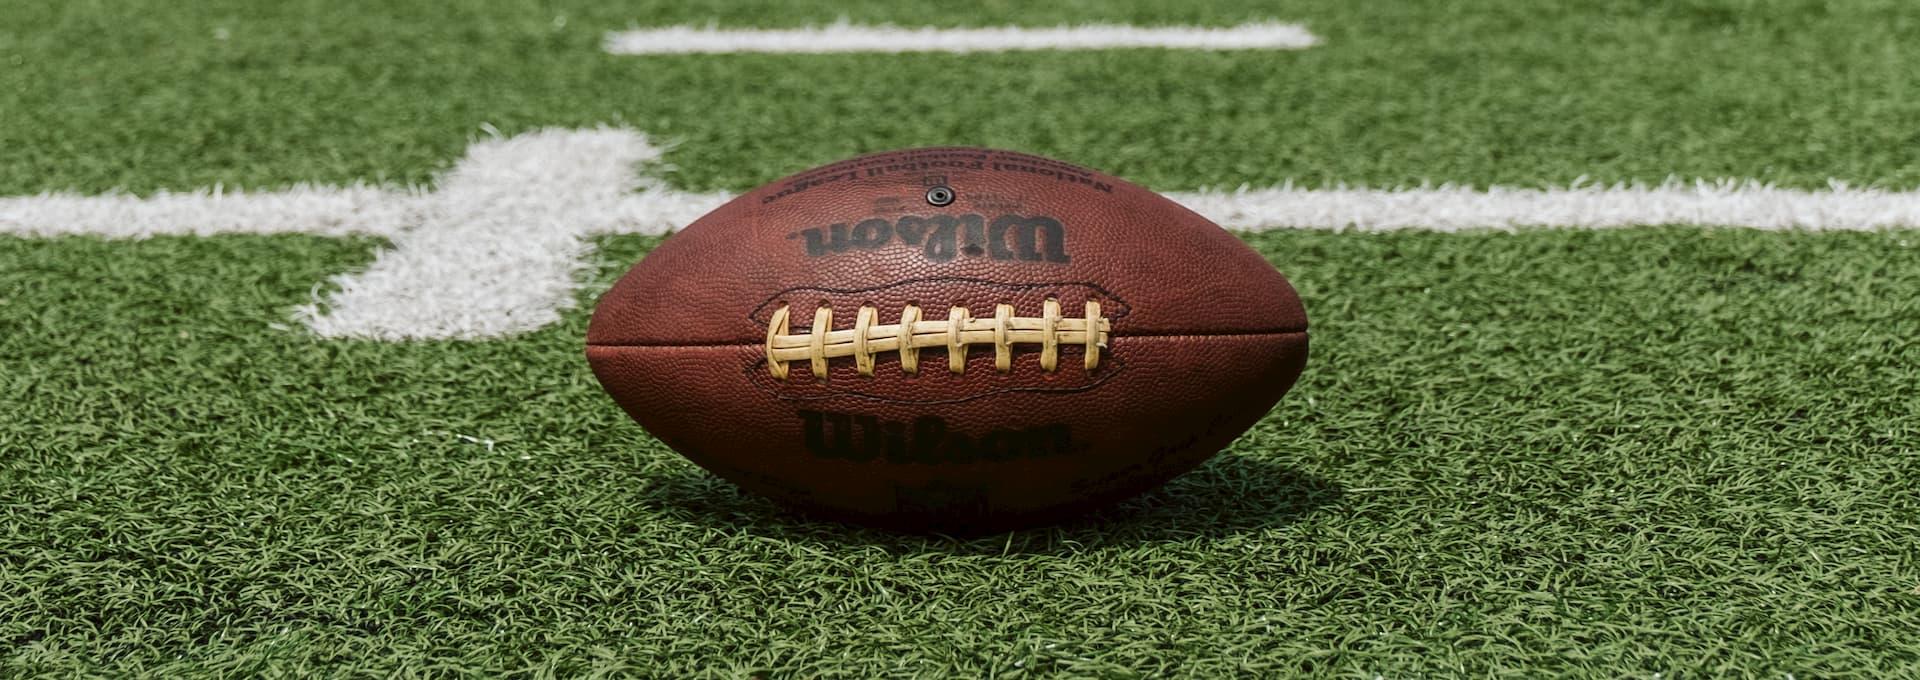 NFL Teams Are Winning Influencer Marketing